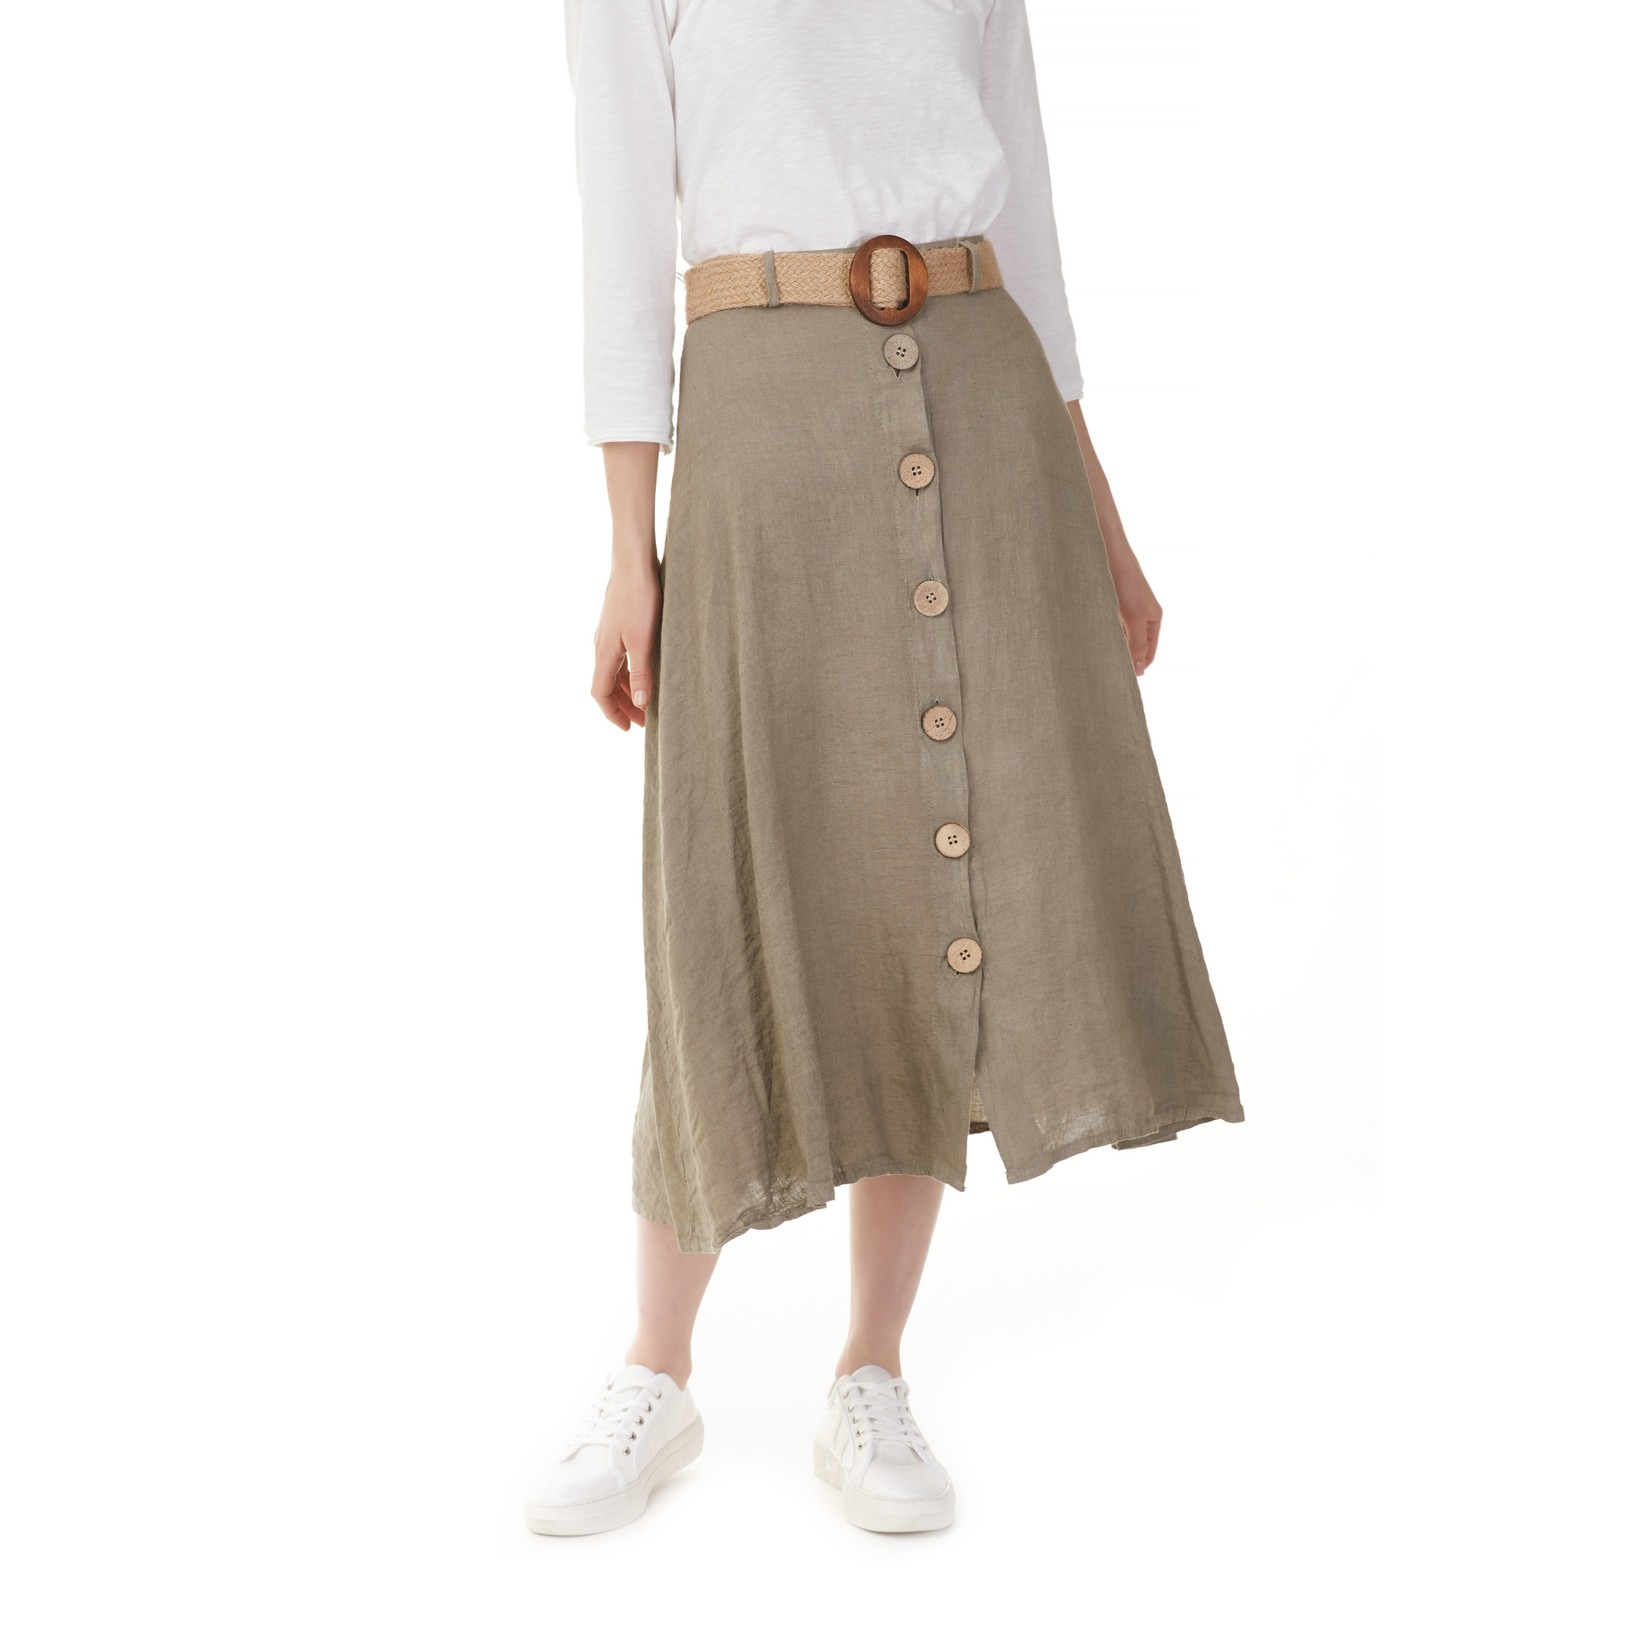 Charlie B Solid Linen Blend Skirt with Belt